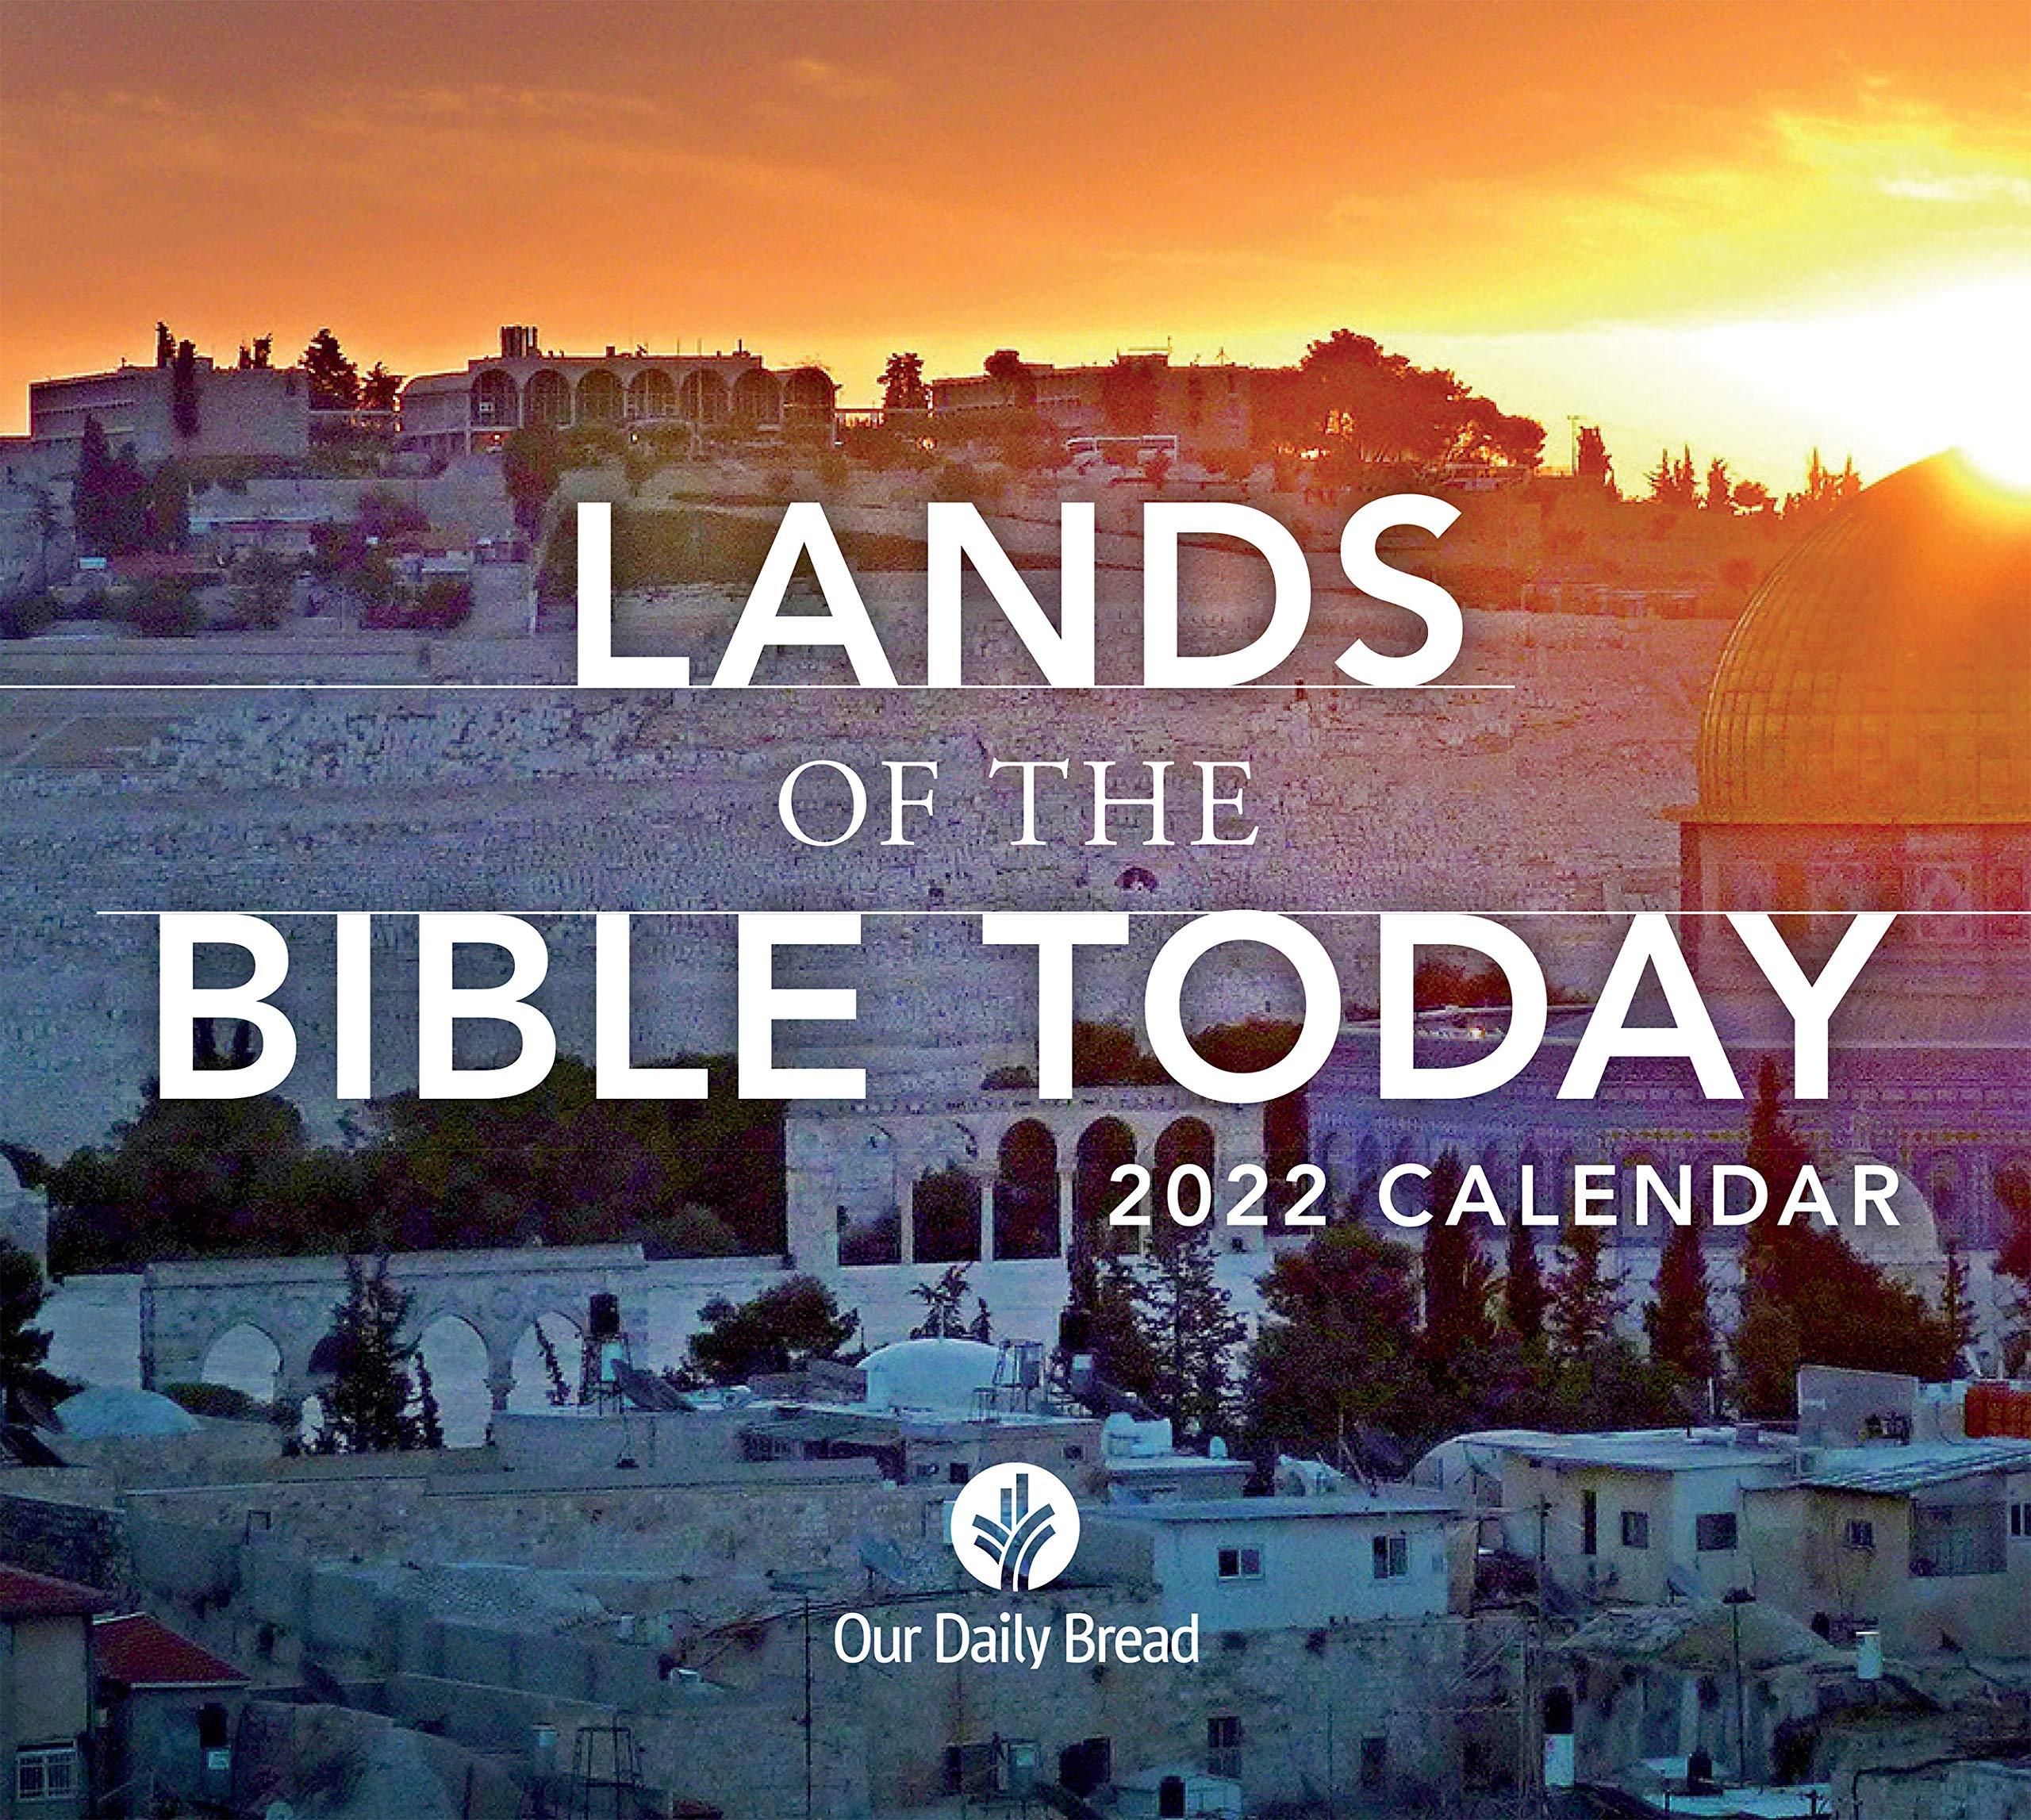 Biblical Calendar 2022.Amazon Com Lands Of The Bible Today 2022 Calendar 9781640701144 Our Daily Bread Ministries Books